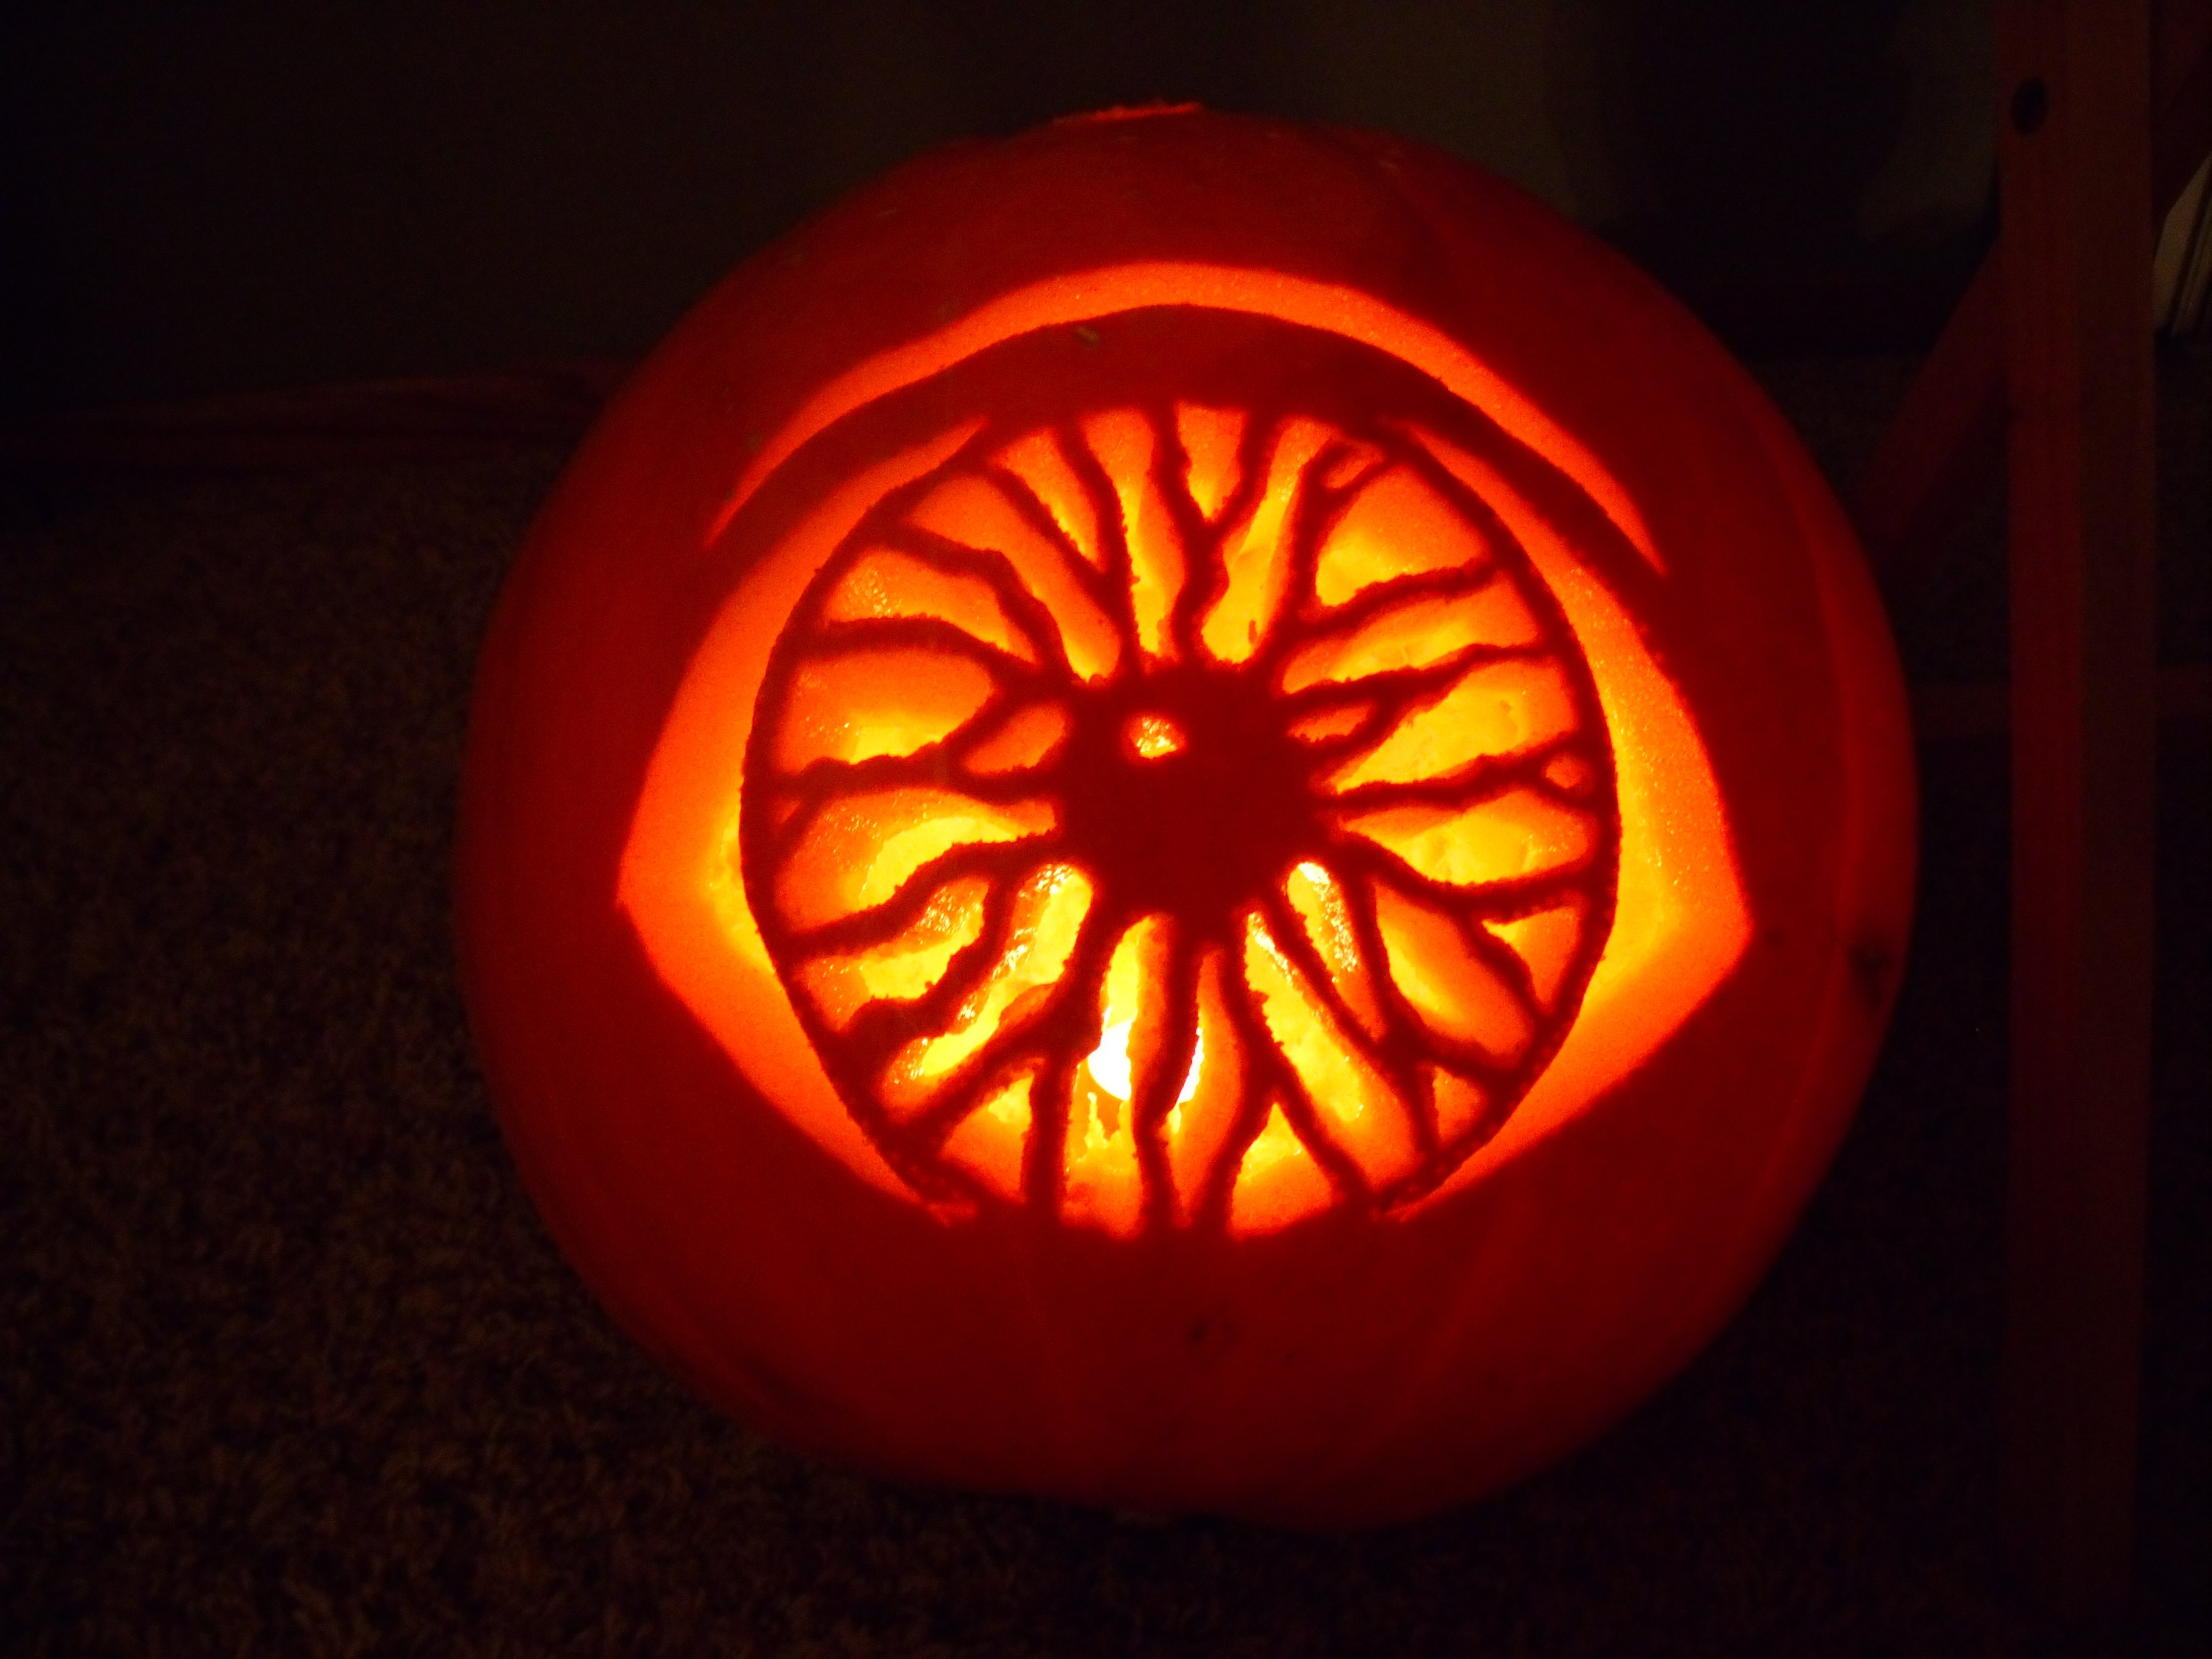 10 Gorgeous Easy Cool Pumpkin Carving Ideas ideas cool pumpkin carving designs 2021